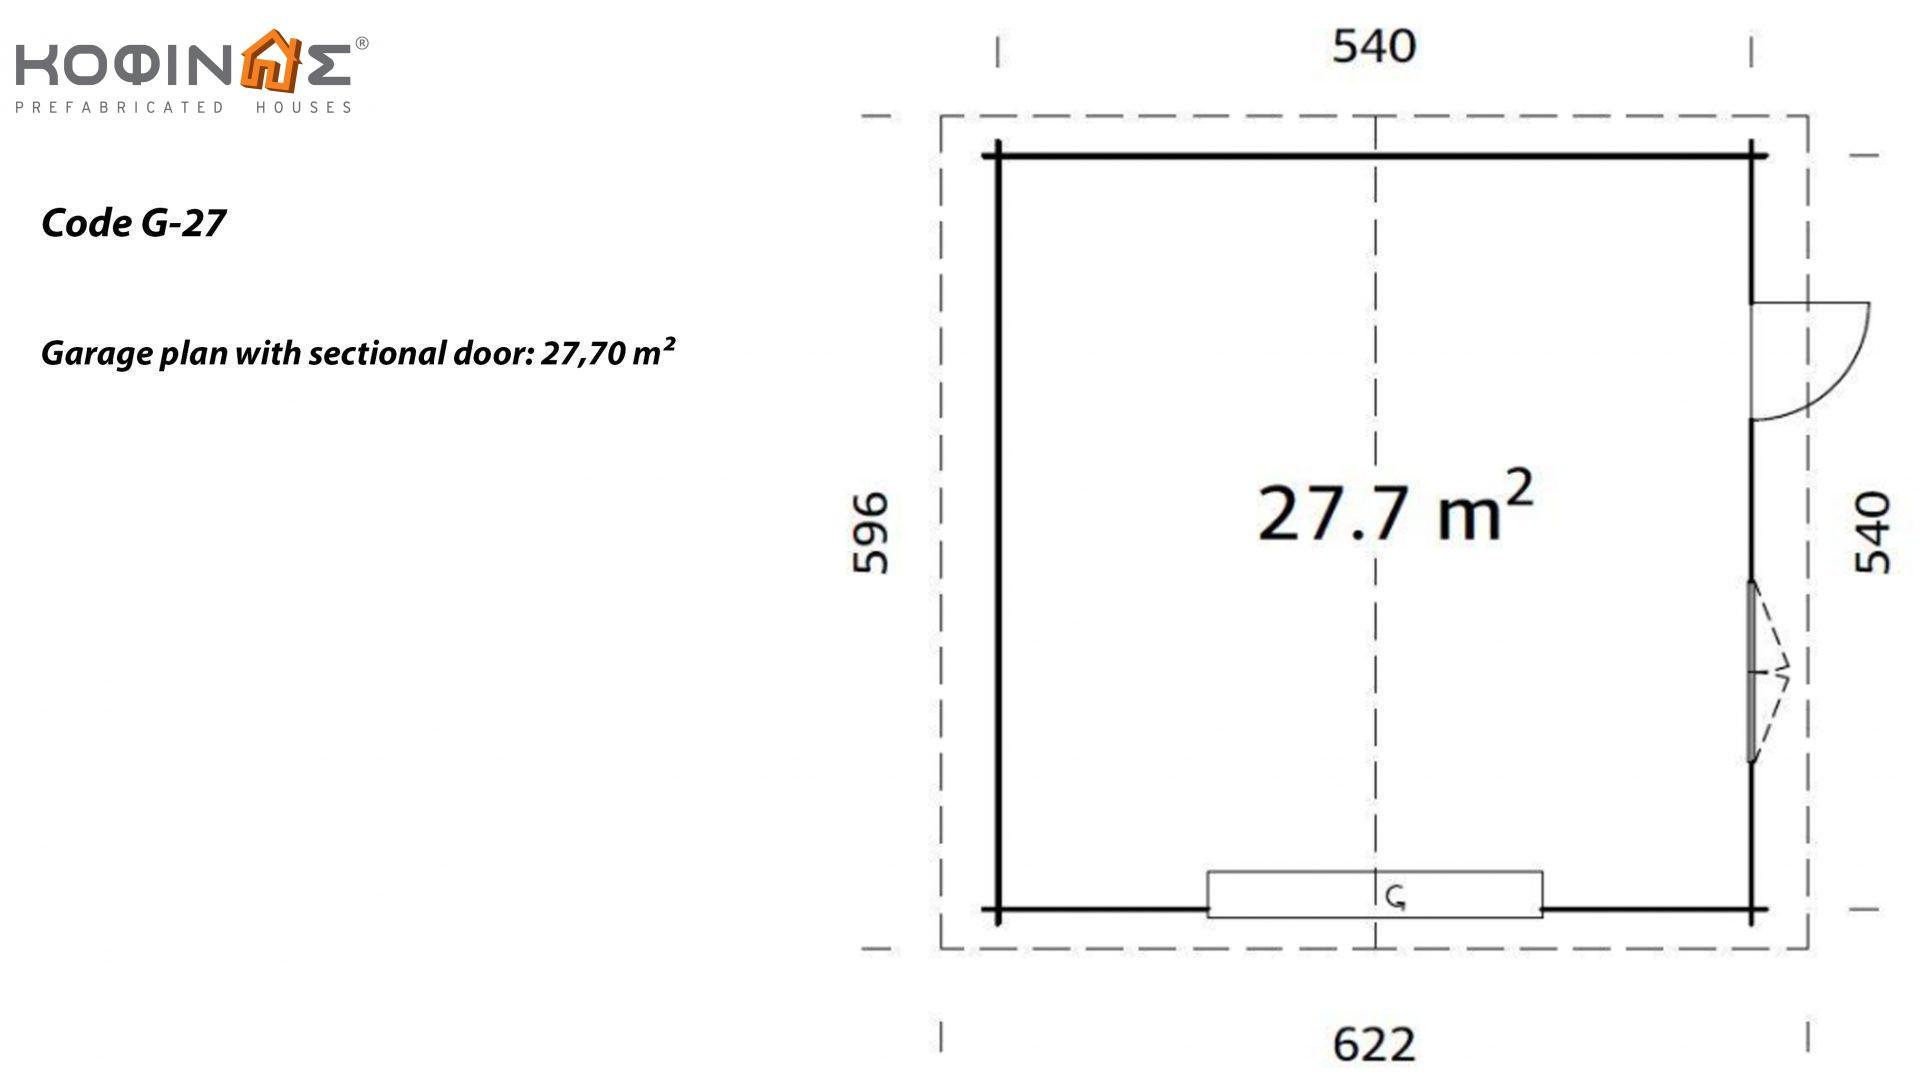 Garage G-27, total area 27.70 m²